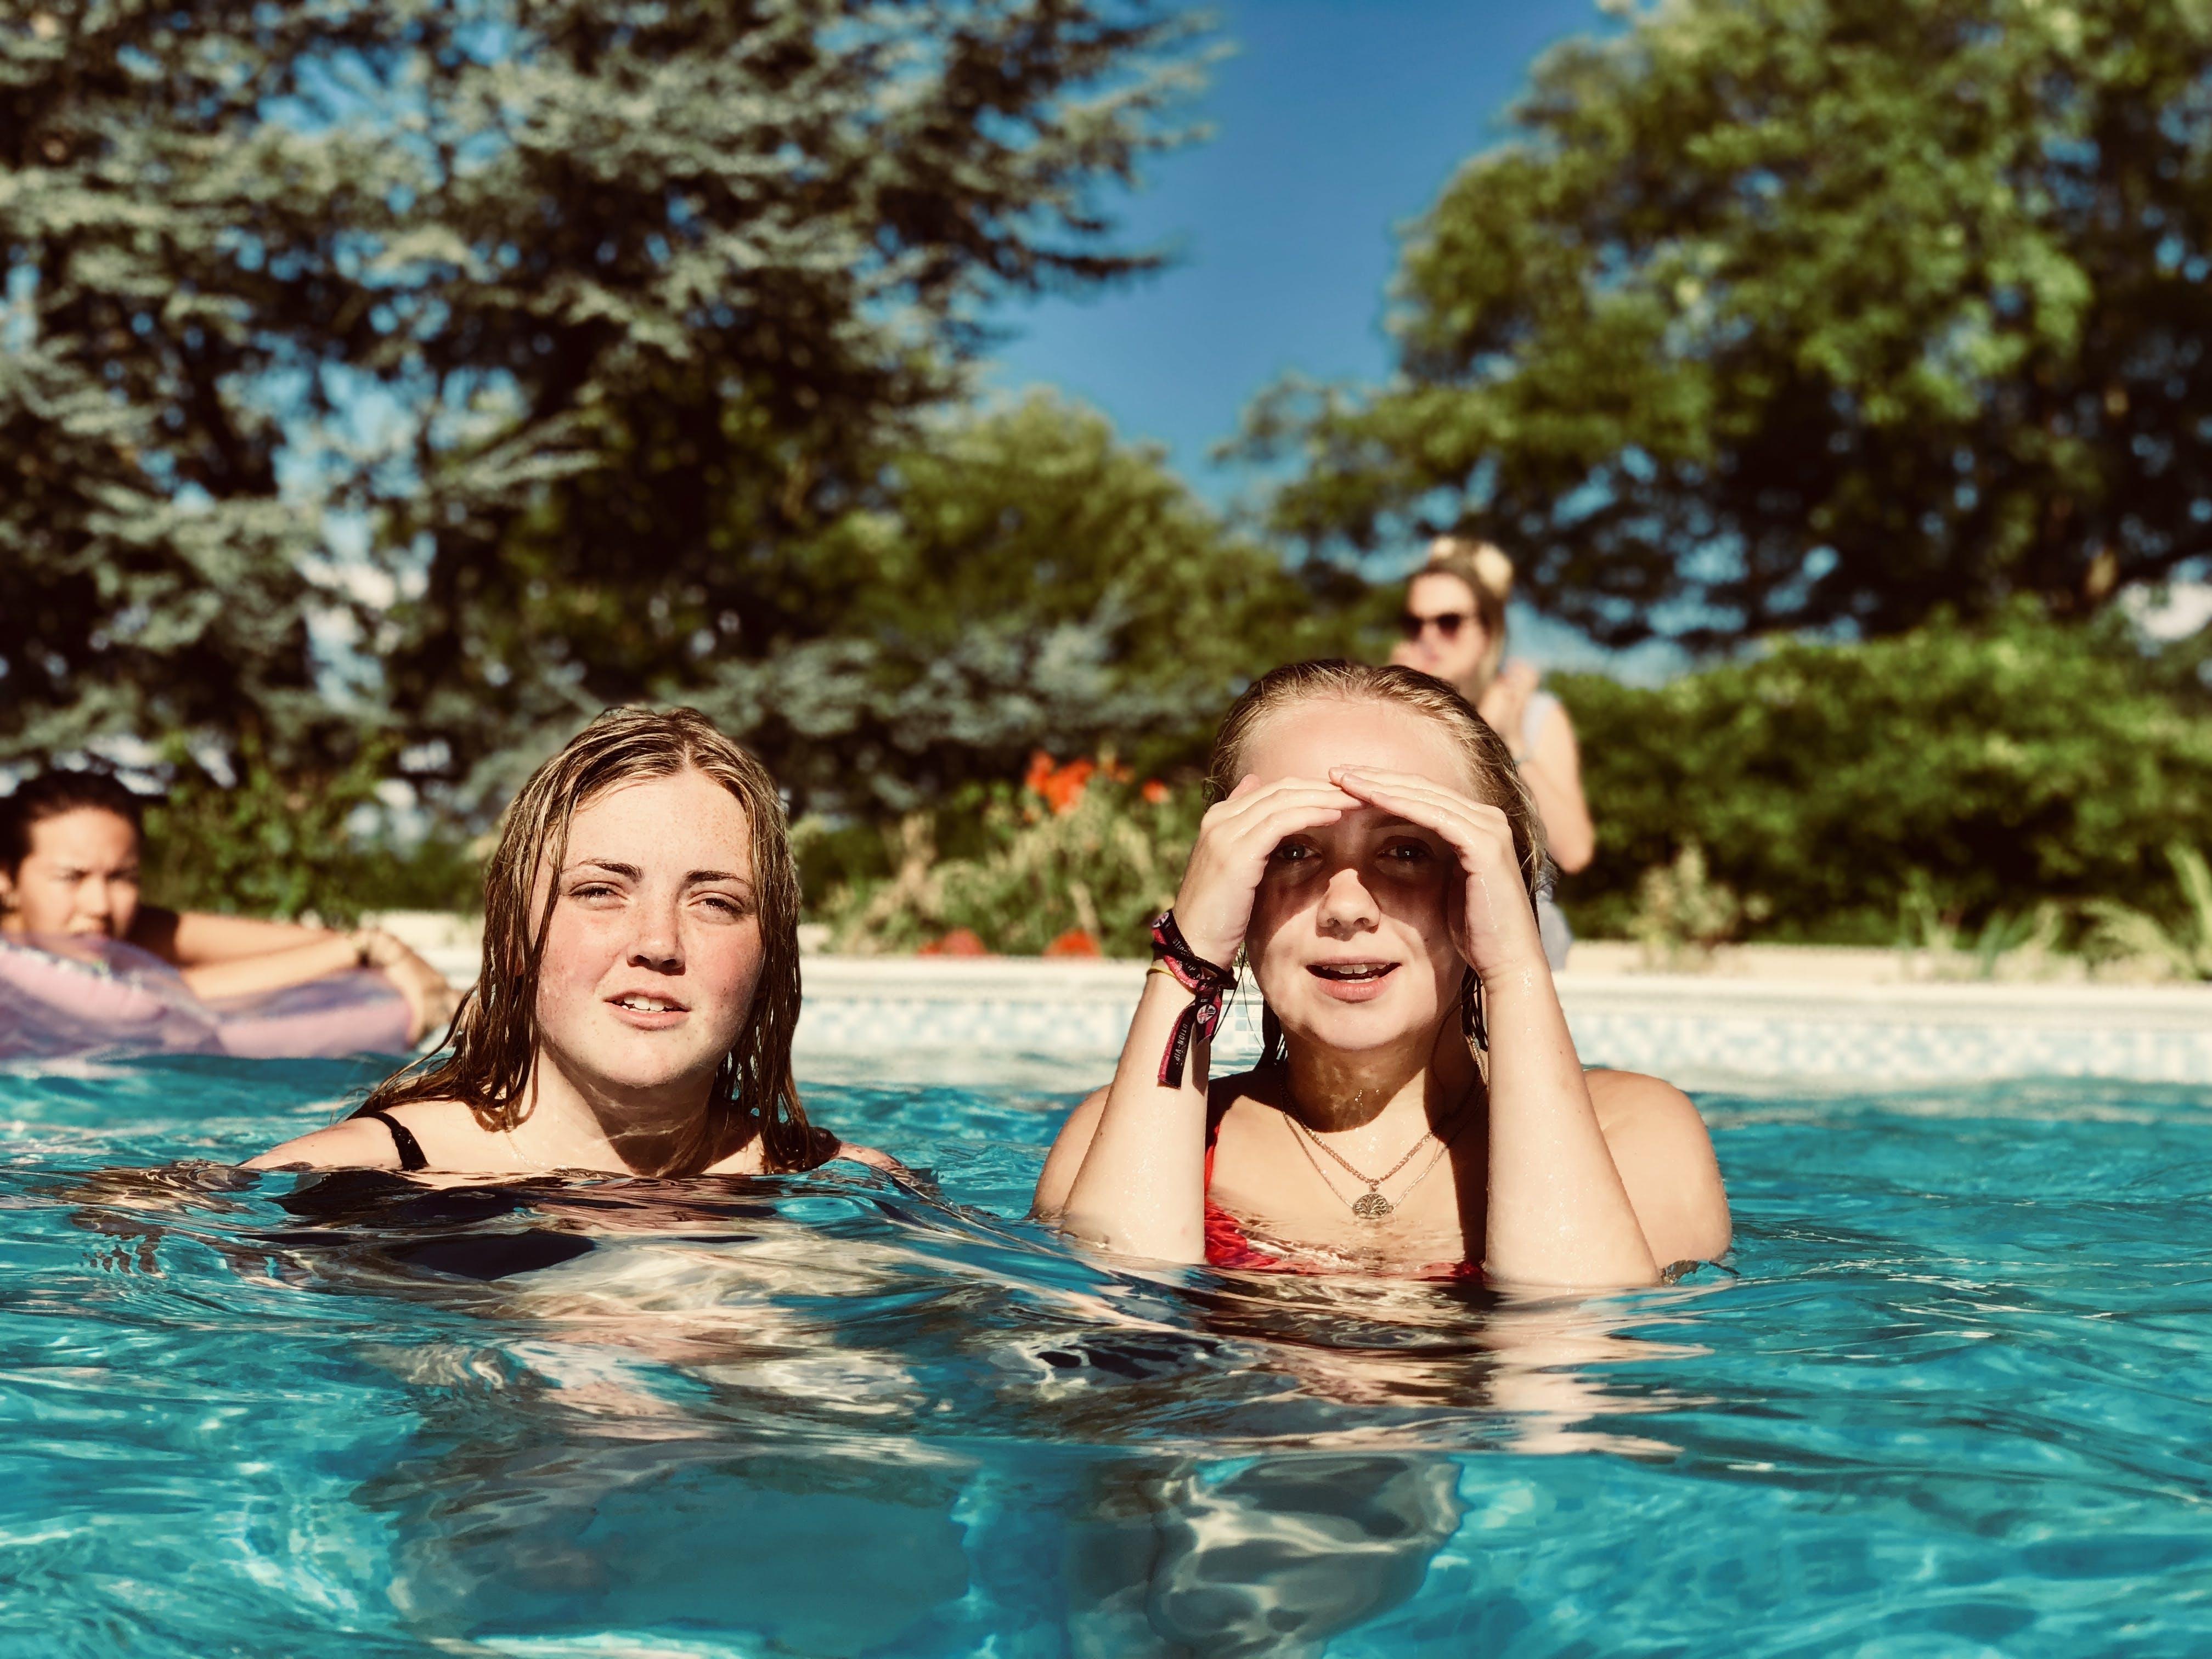 Two Women in Swimming Pool Near Trees